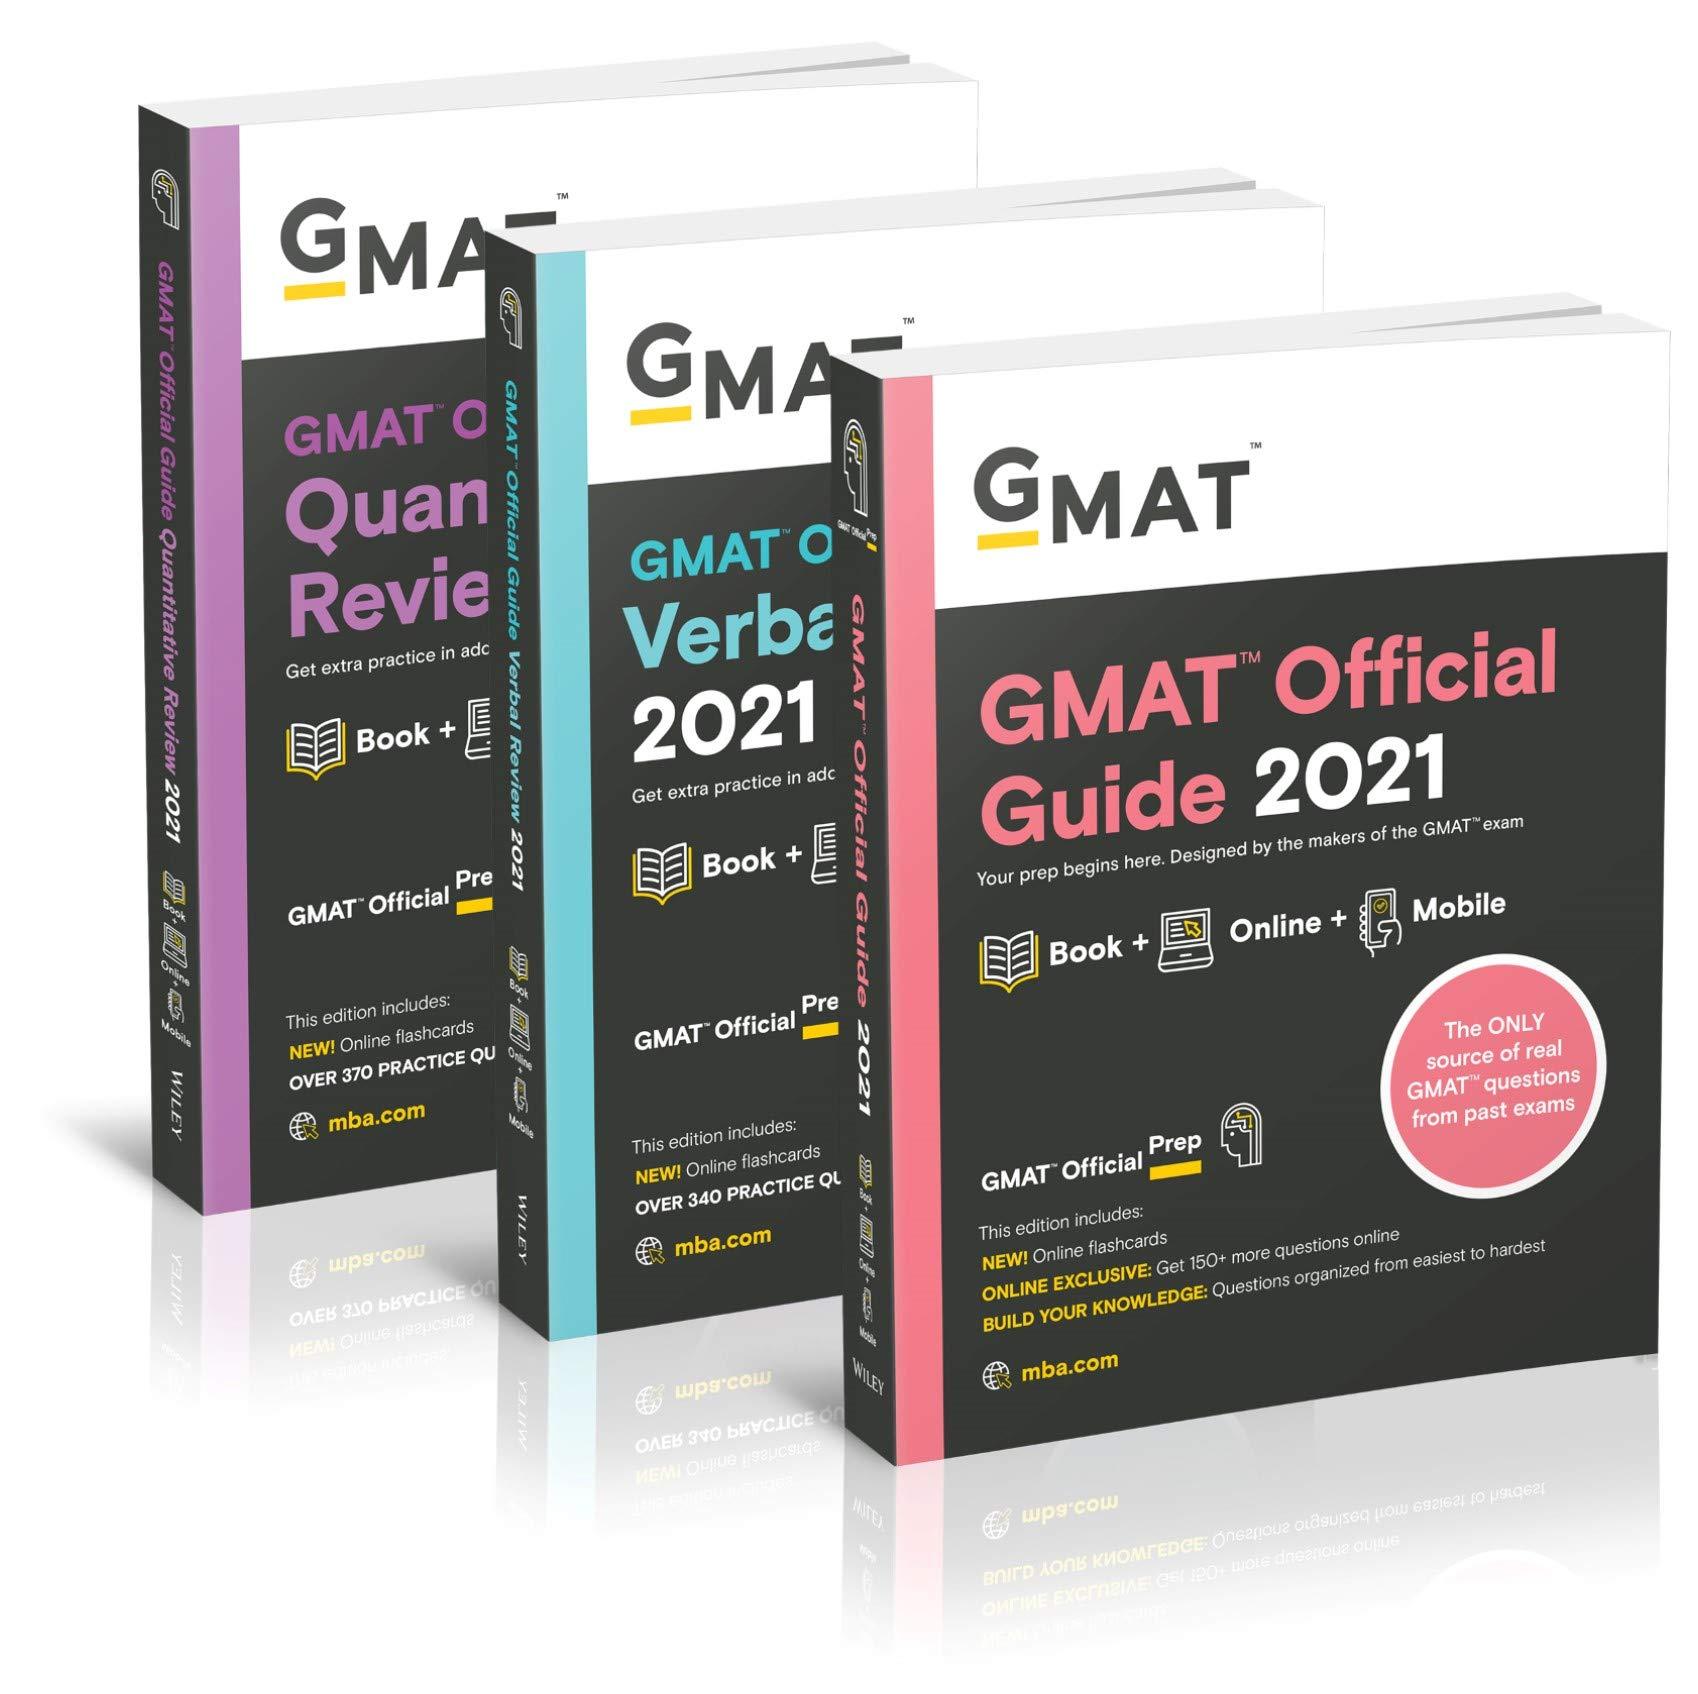 GMAT学习材料 - 加拿大GMAT权威机构